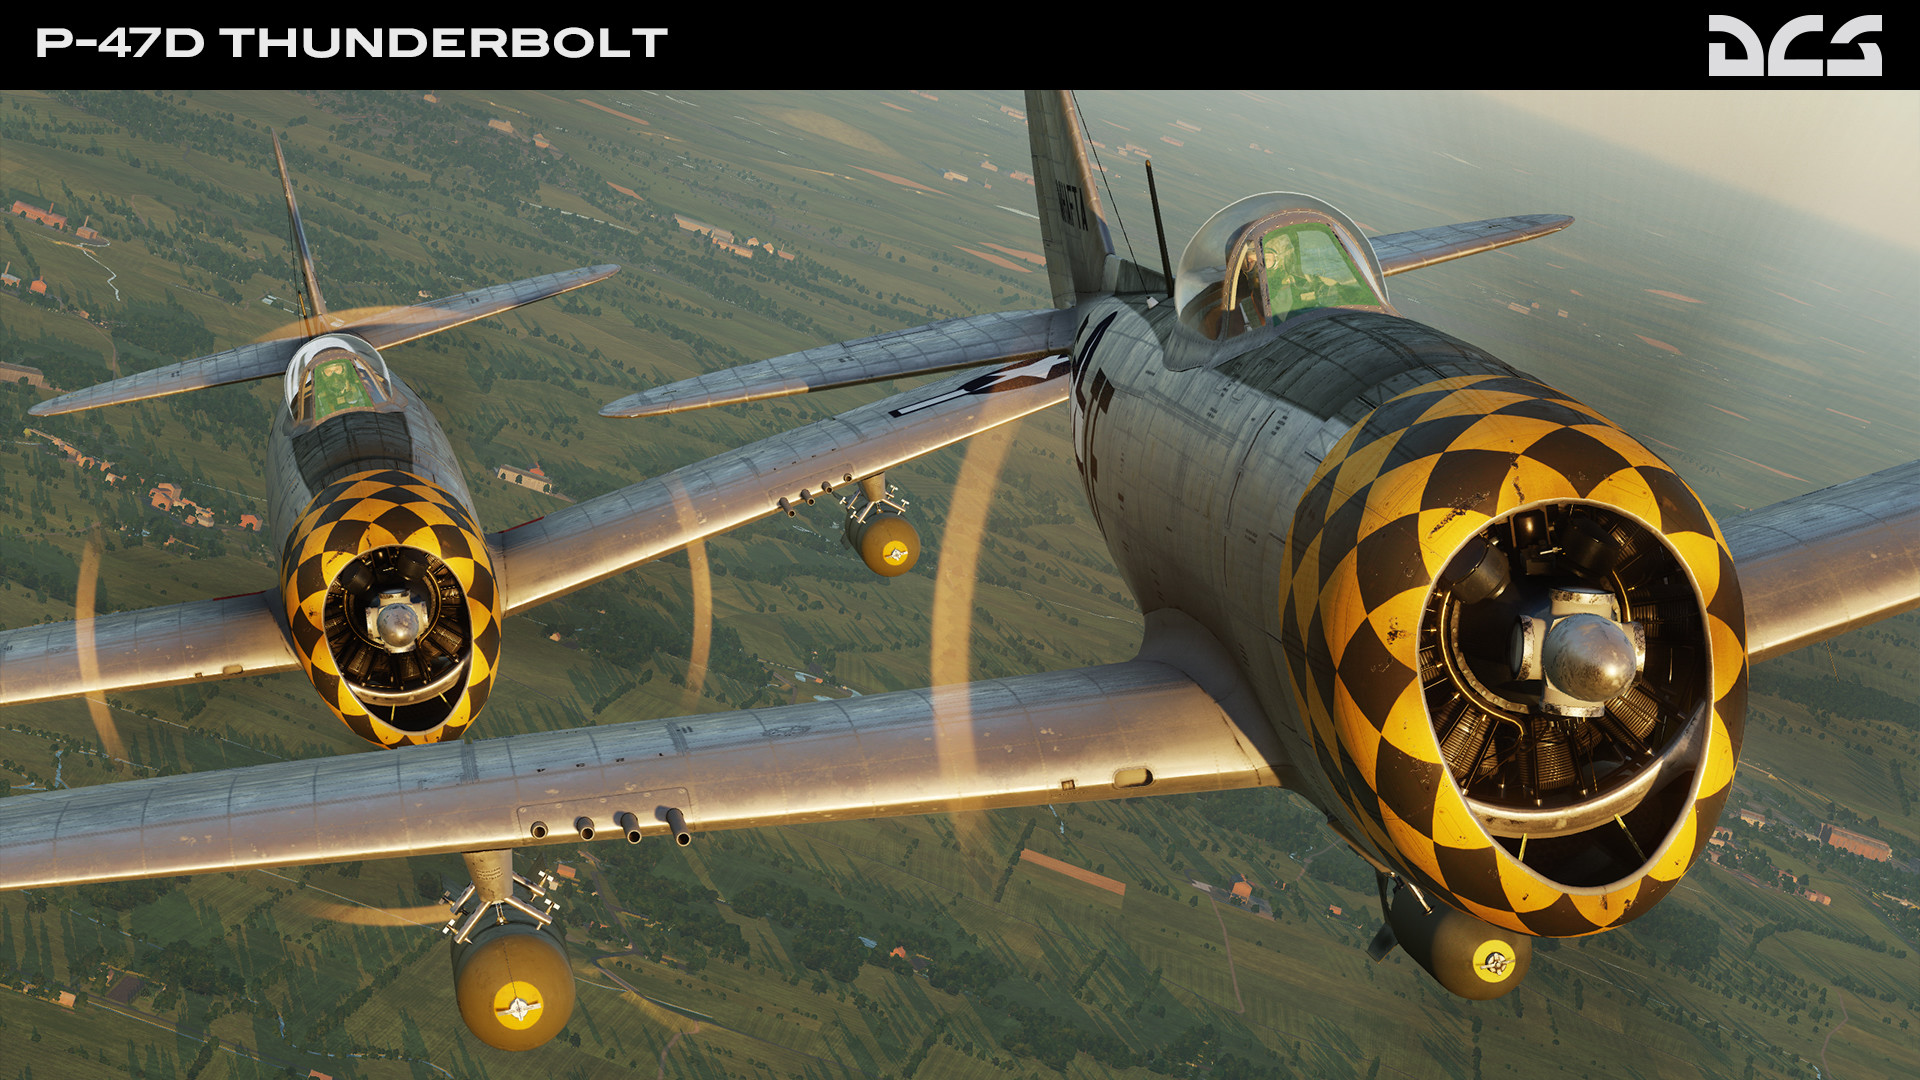 DCS: P-47D Thunderbolt PC Key Fiyatları